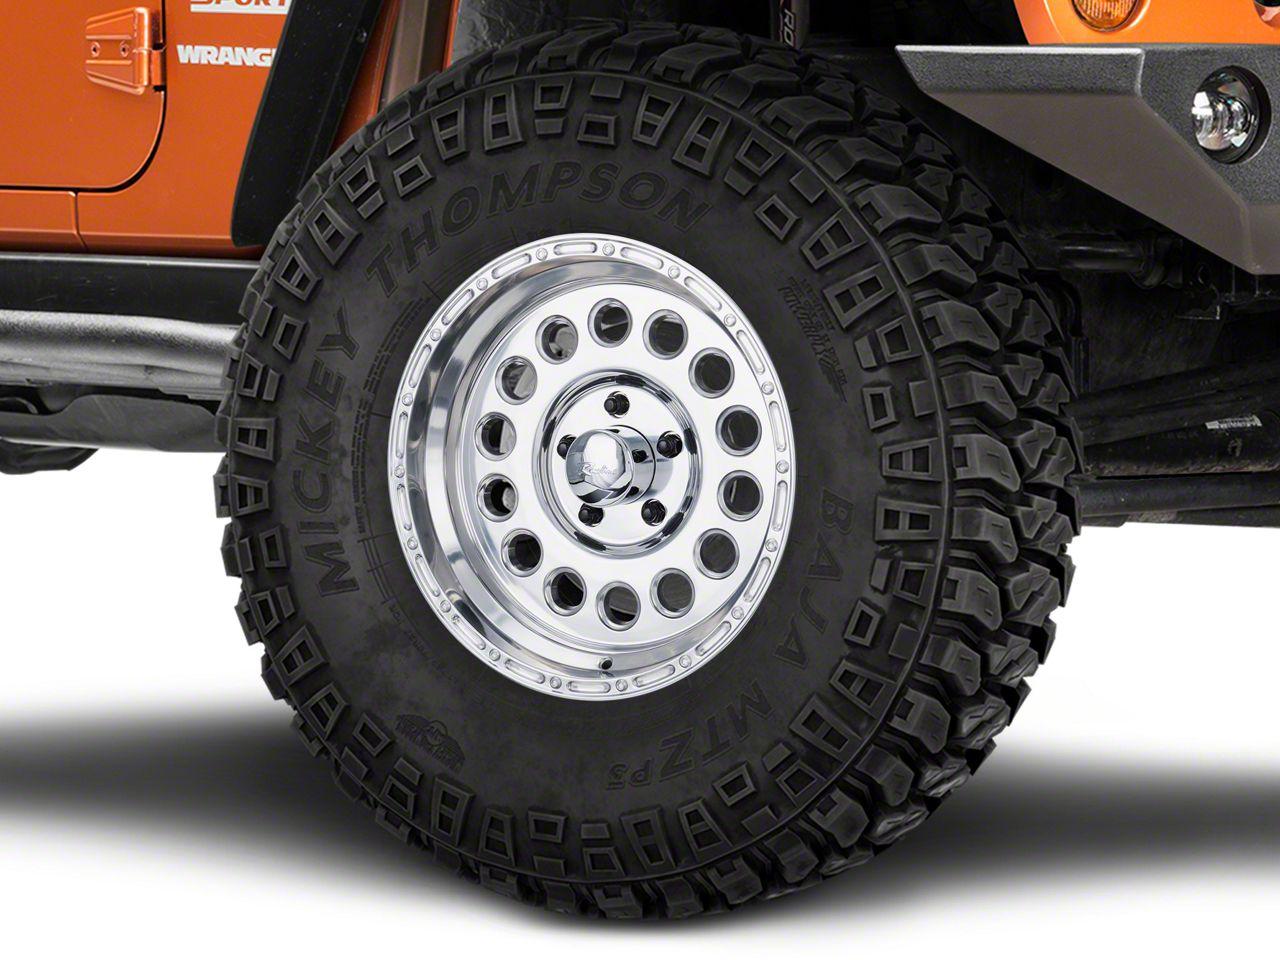 pro p wheels jeep wrangler series 1069 polished wheels j108386 Jeep Wrangler Jk Interior raceline